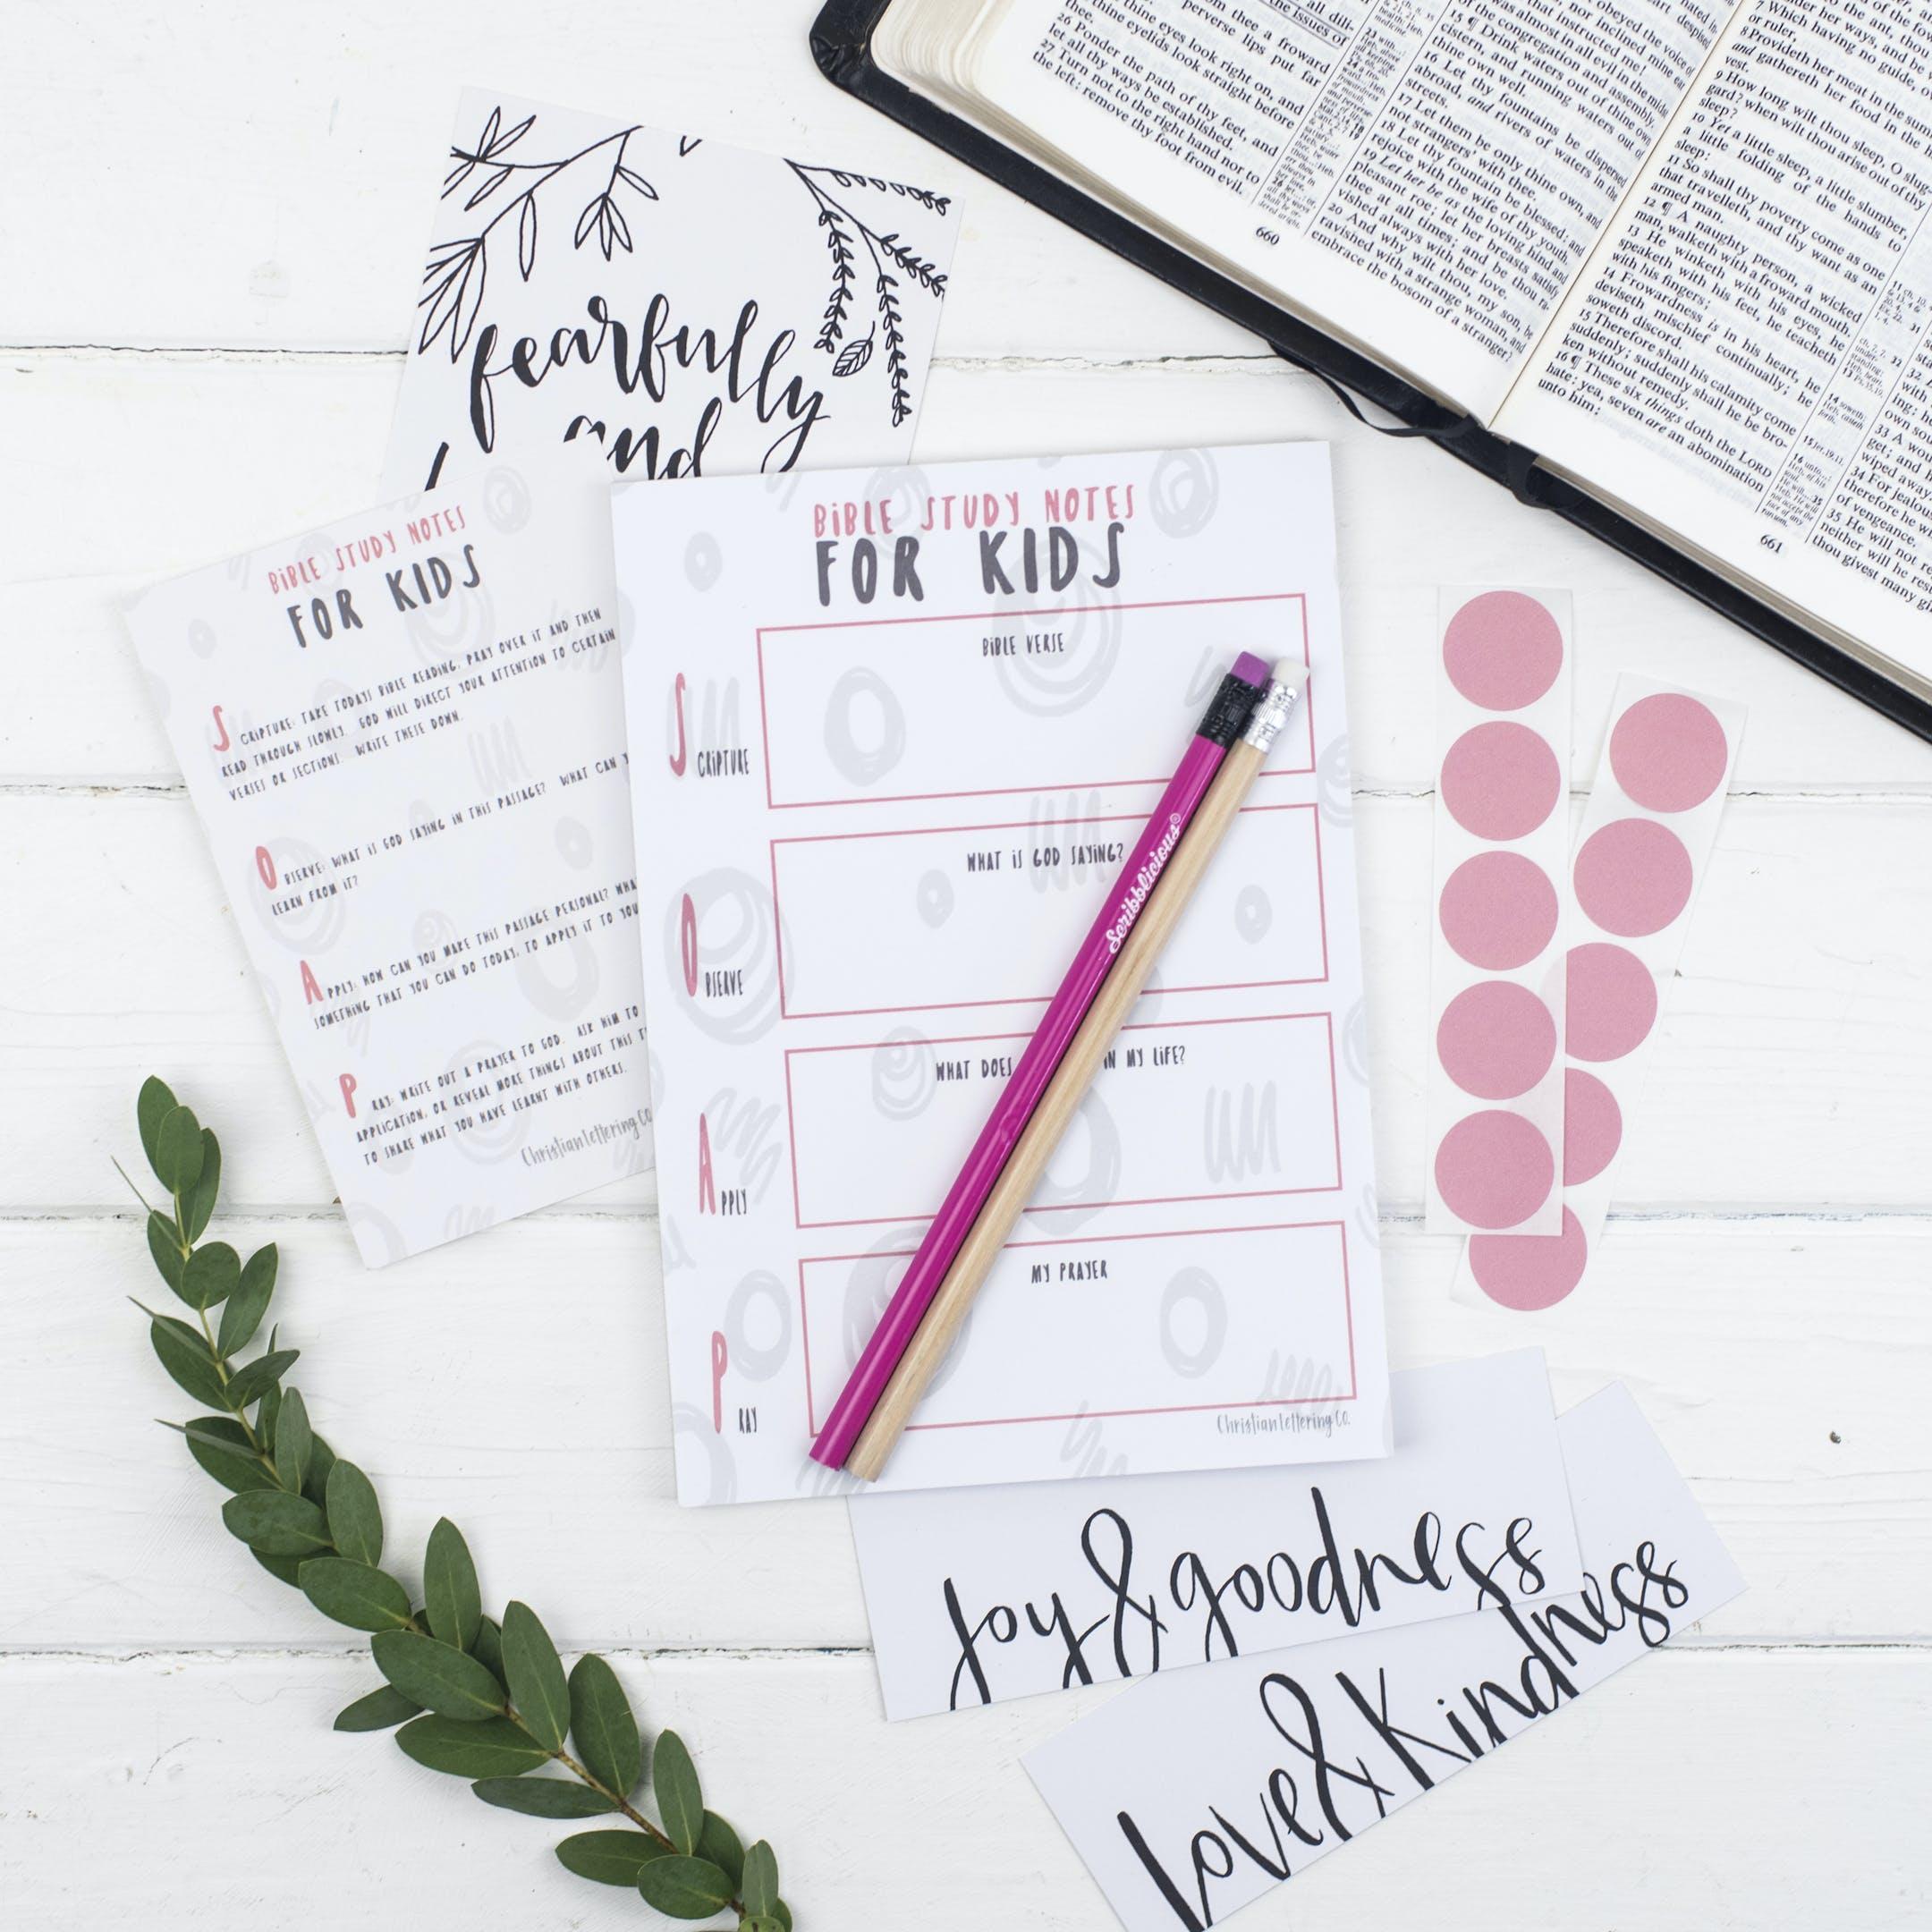 Bible Study Set for Kids - Glory - Christian Lettering Company